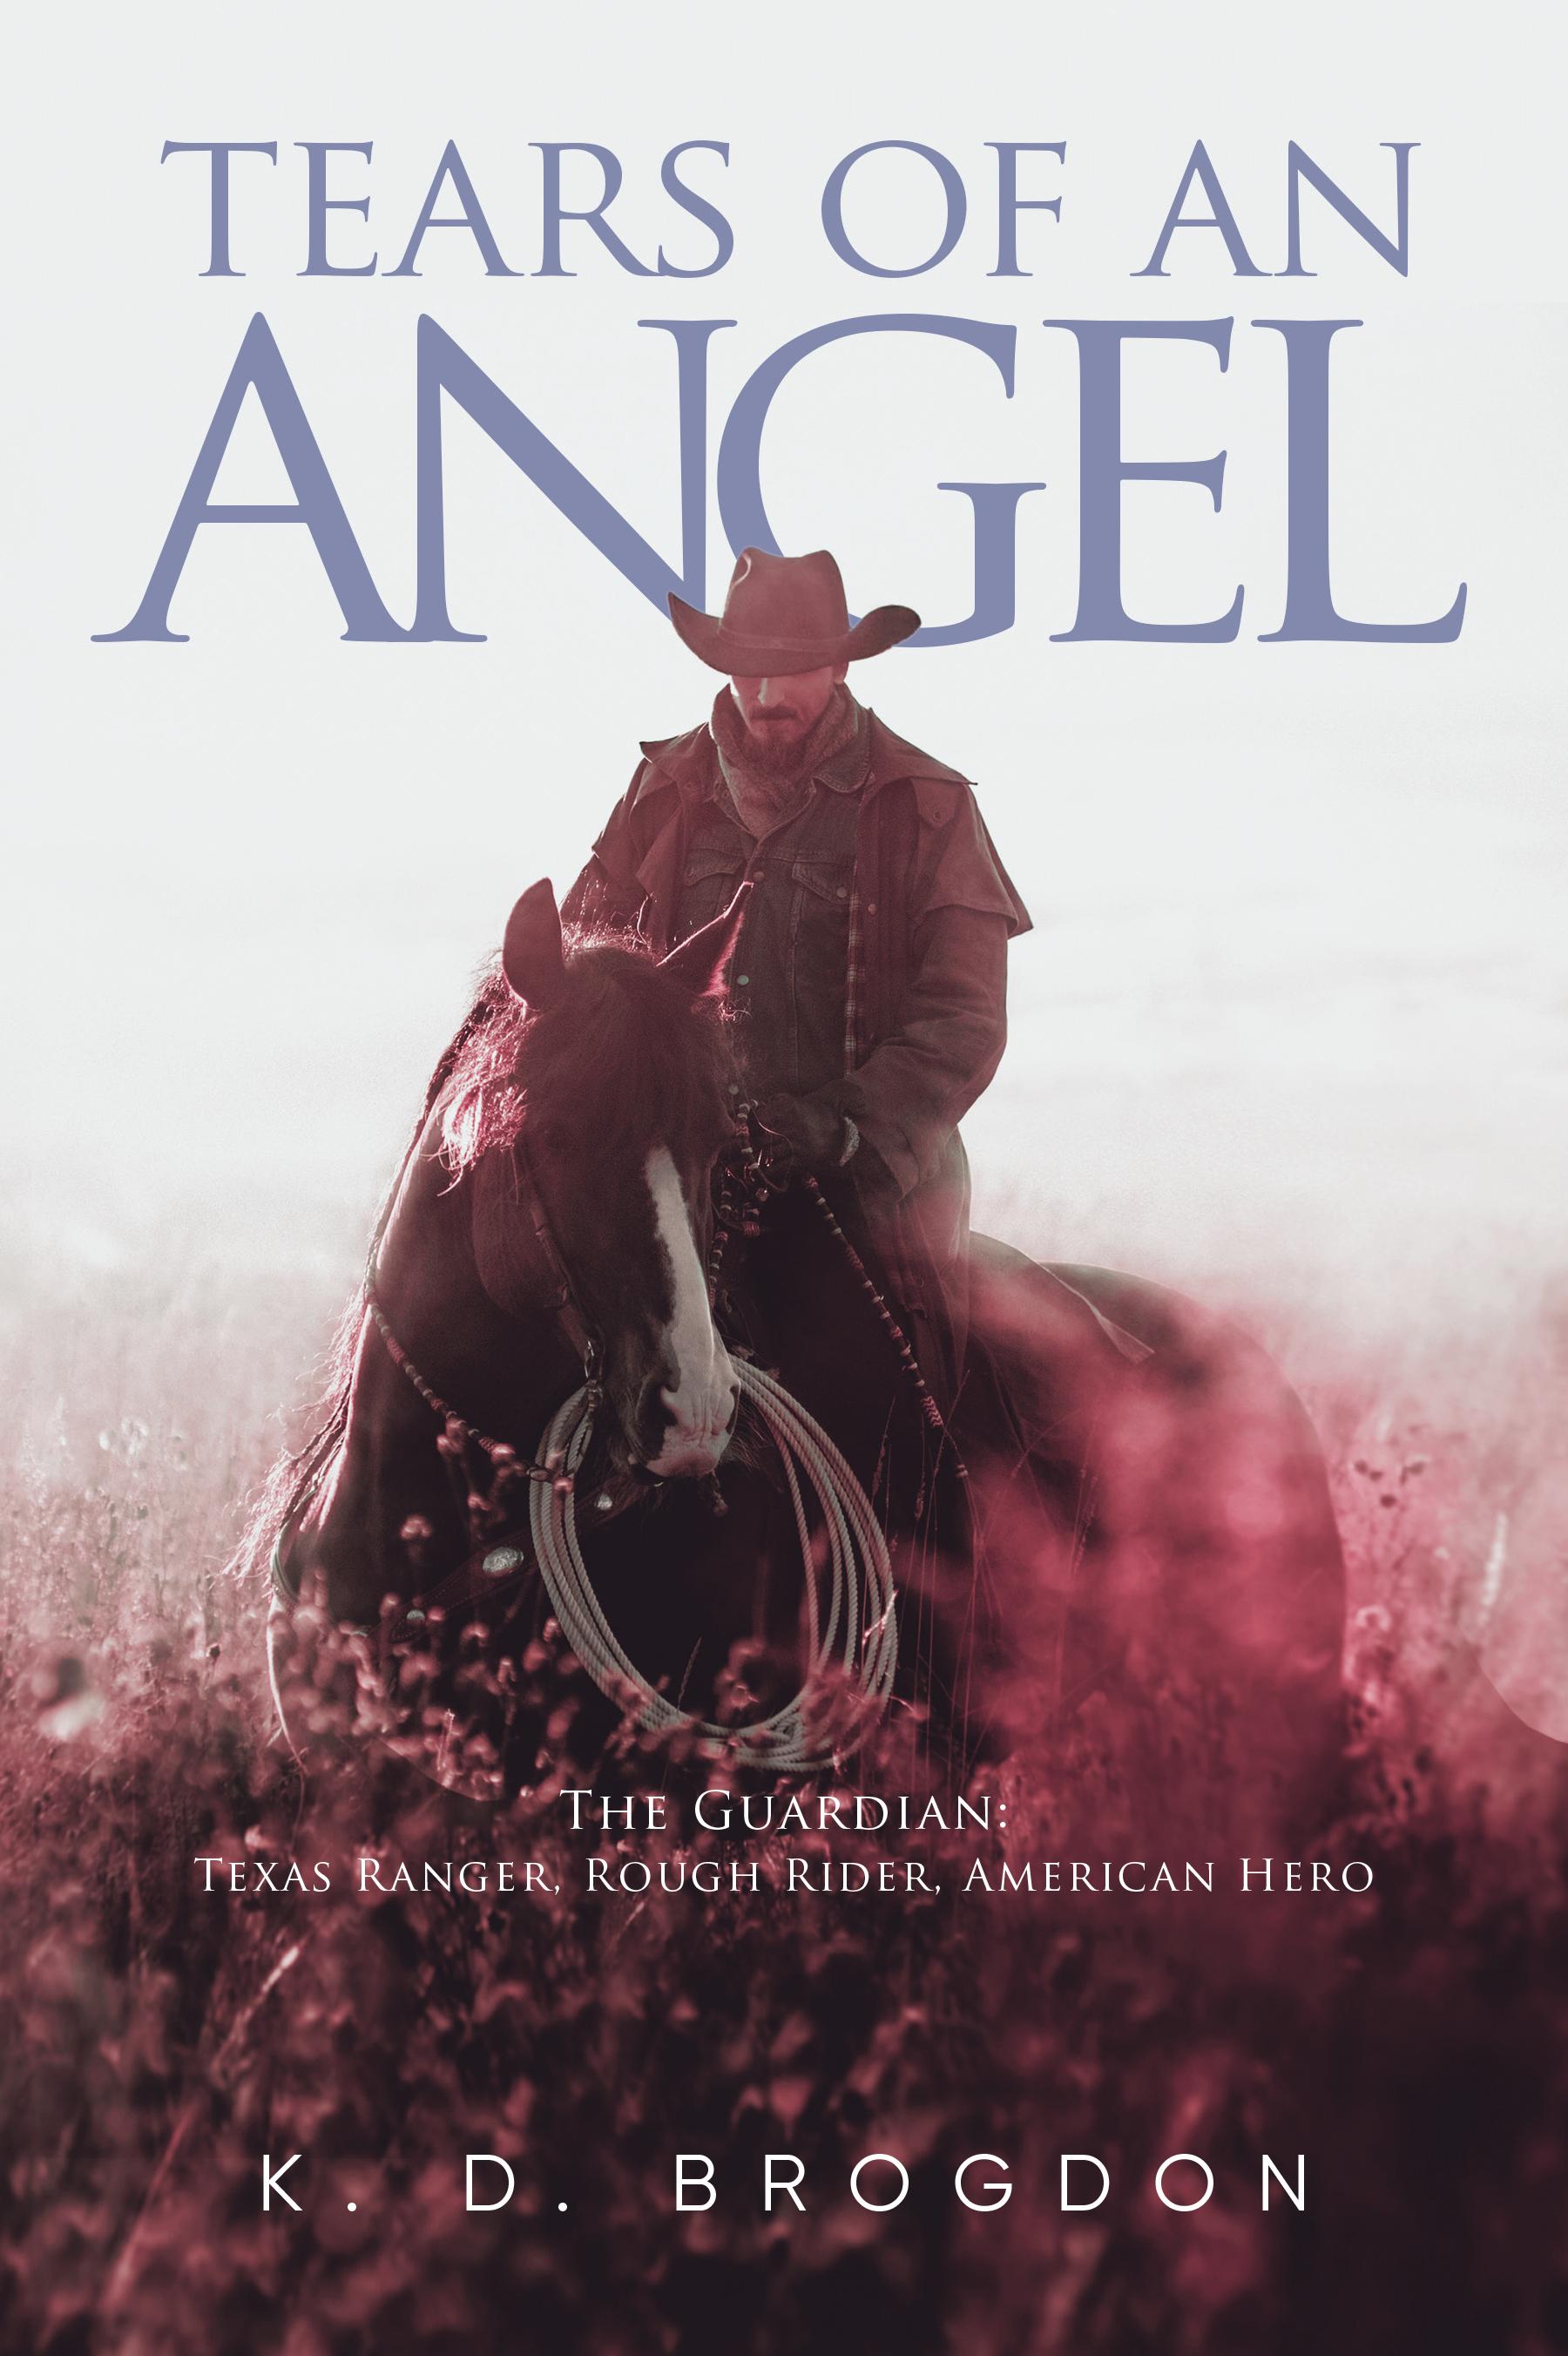 K.D. Brogdon Pens the Heroic Feat of a Texas Ranger